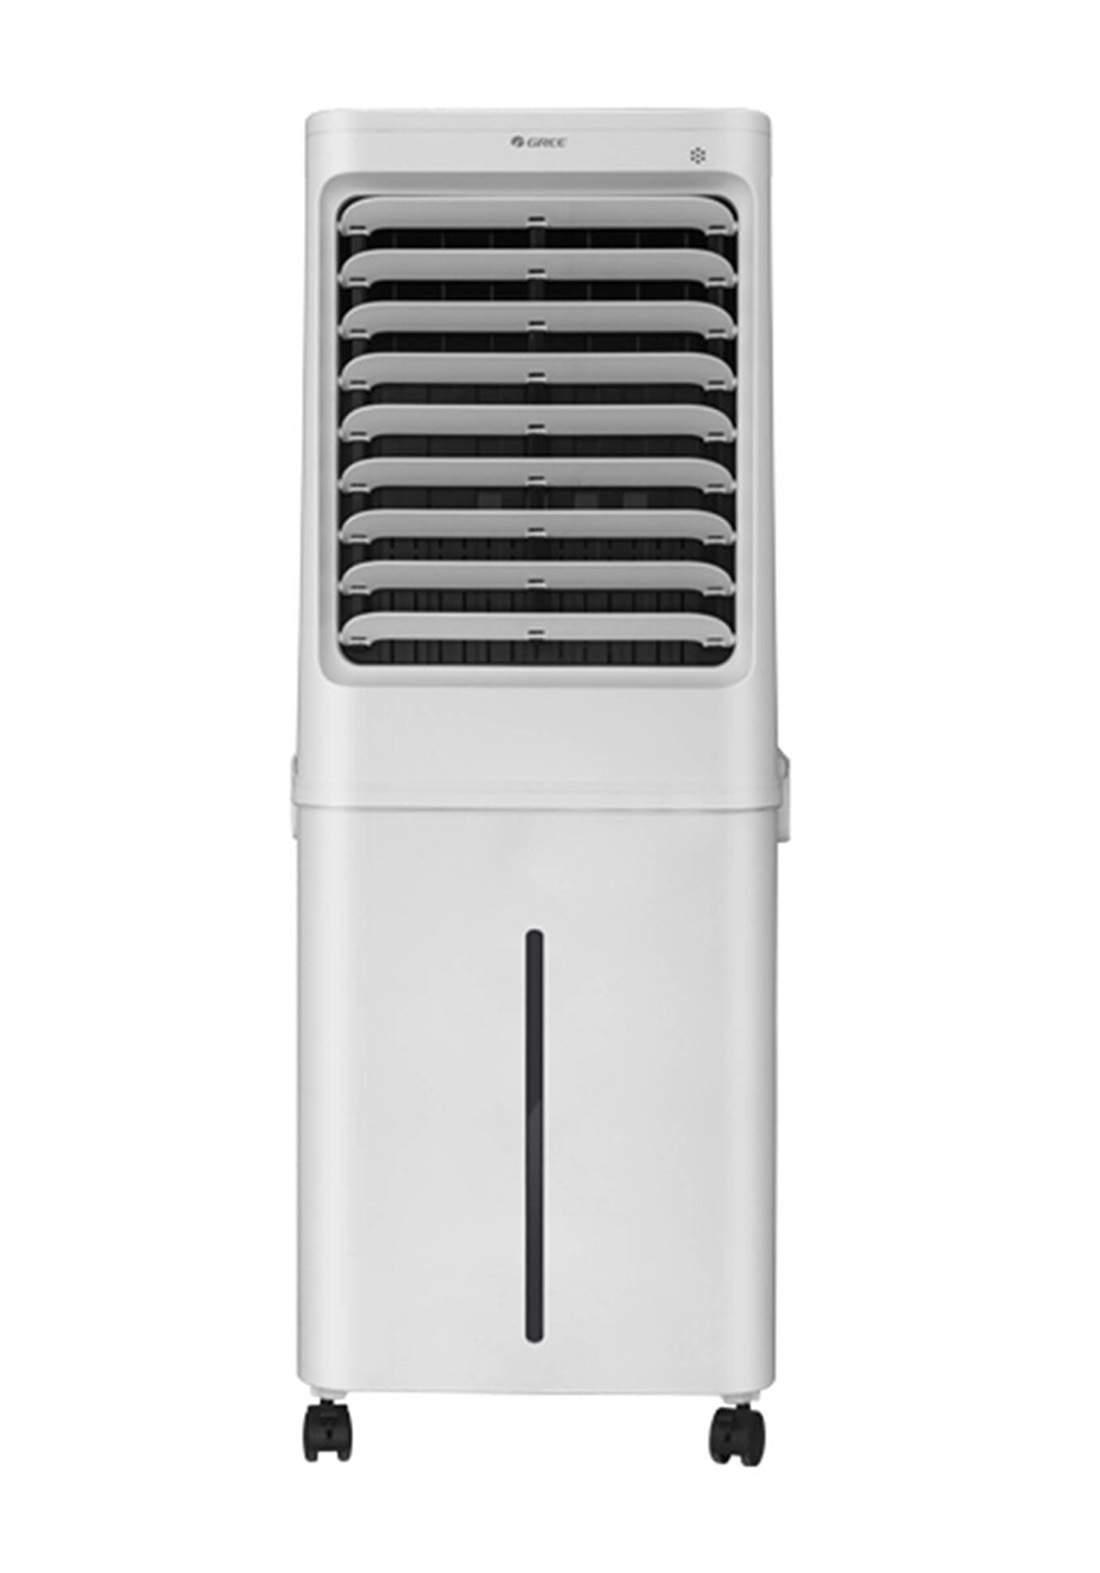 Gree G KSWK-6001 Air Cooler 60 L مبردة هواء